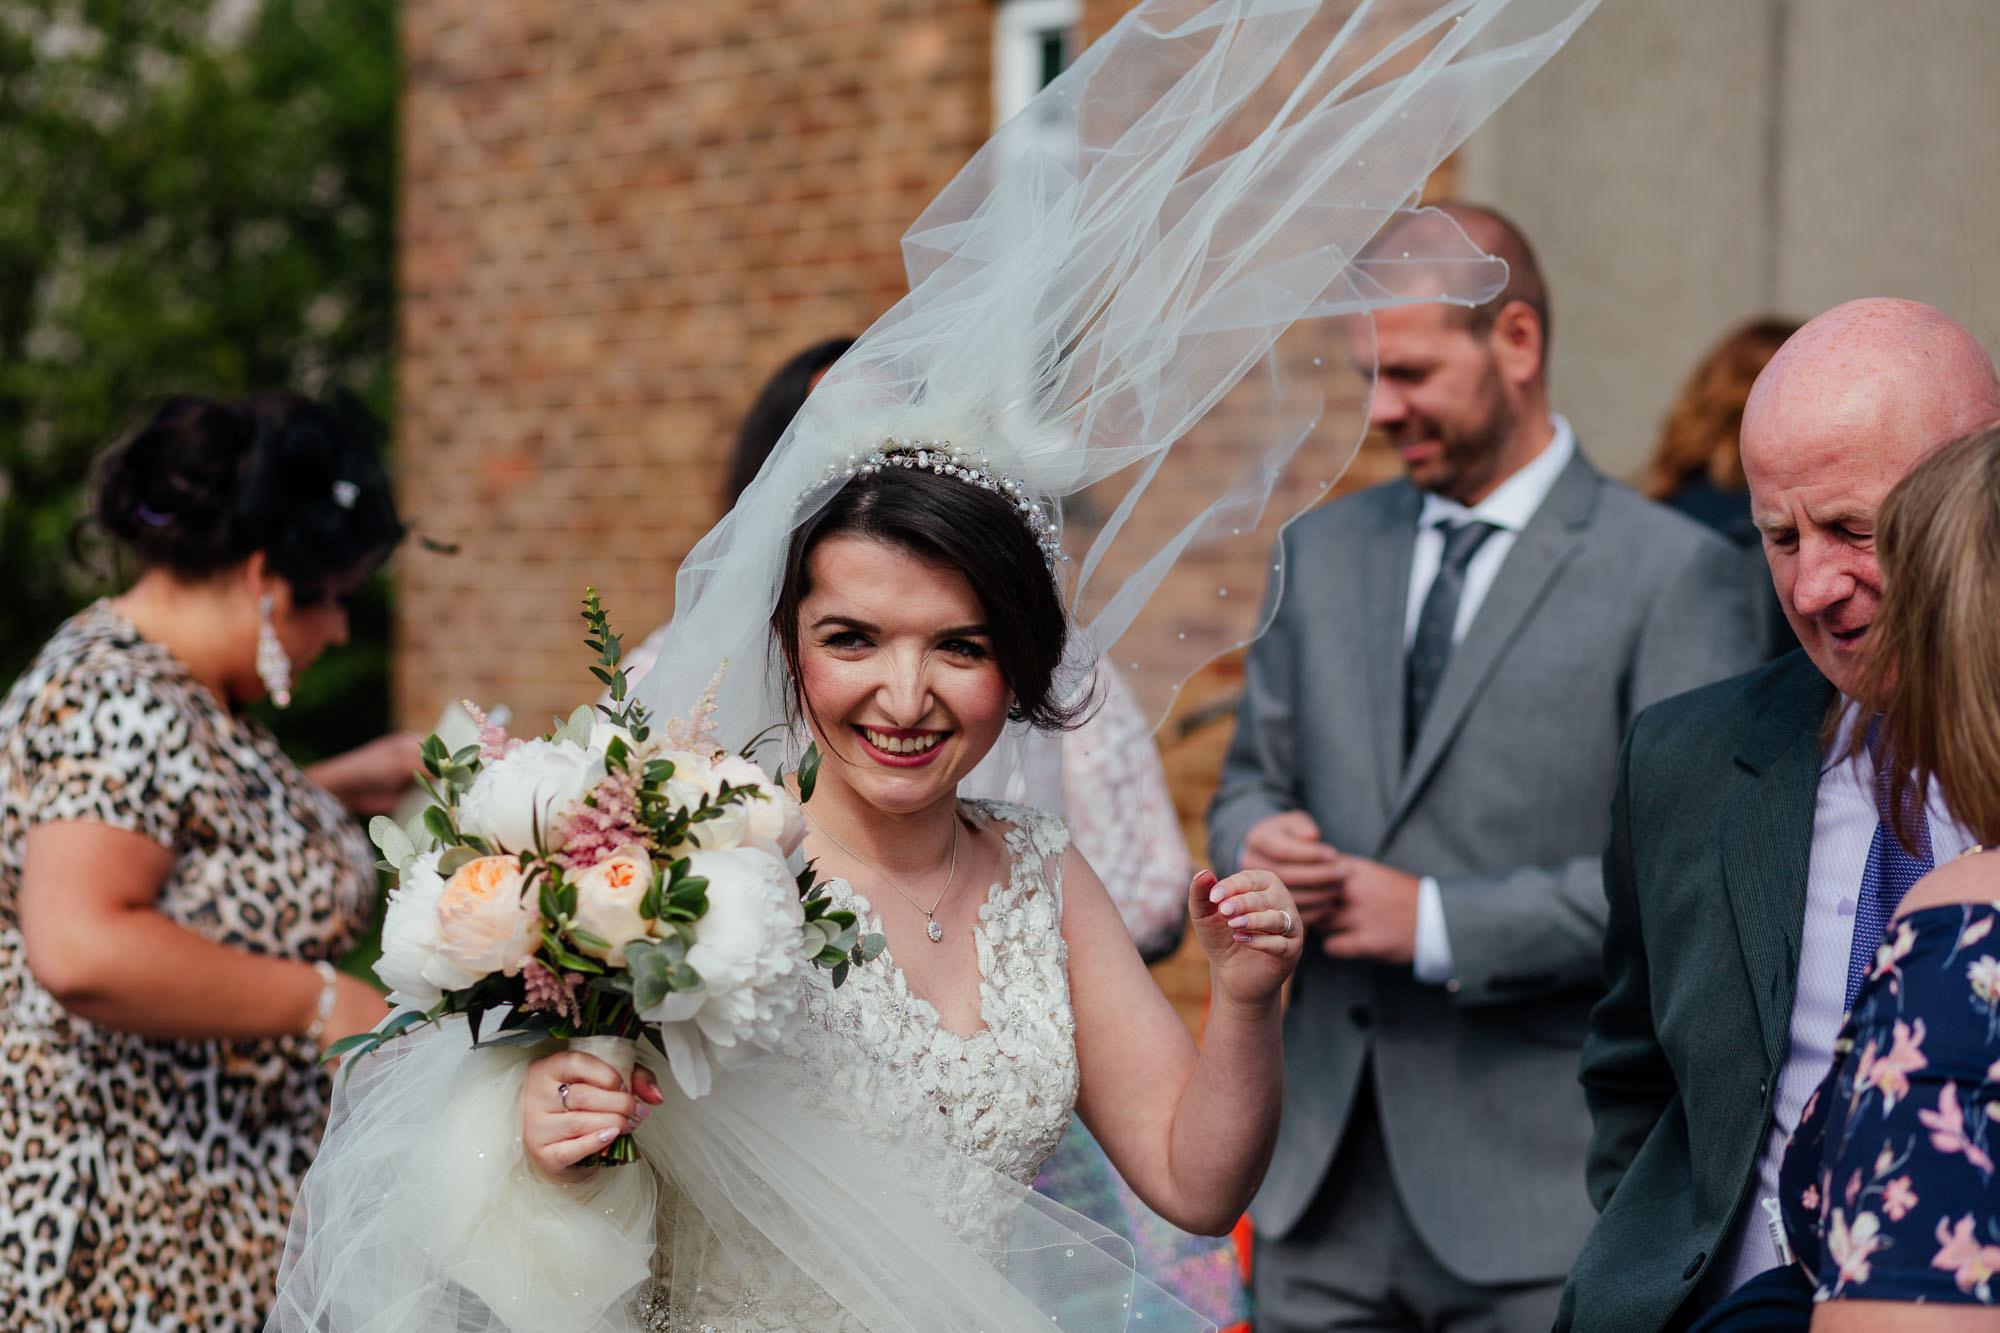 Fotomaki Photography - Glasgow alternative wedding photography